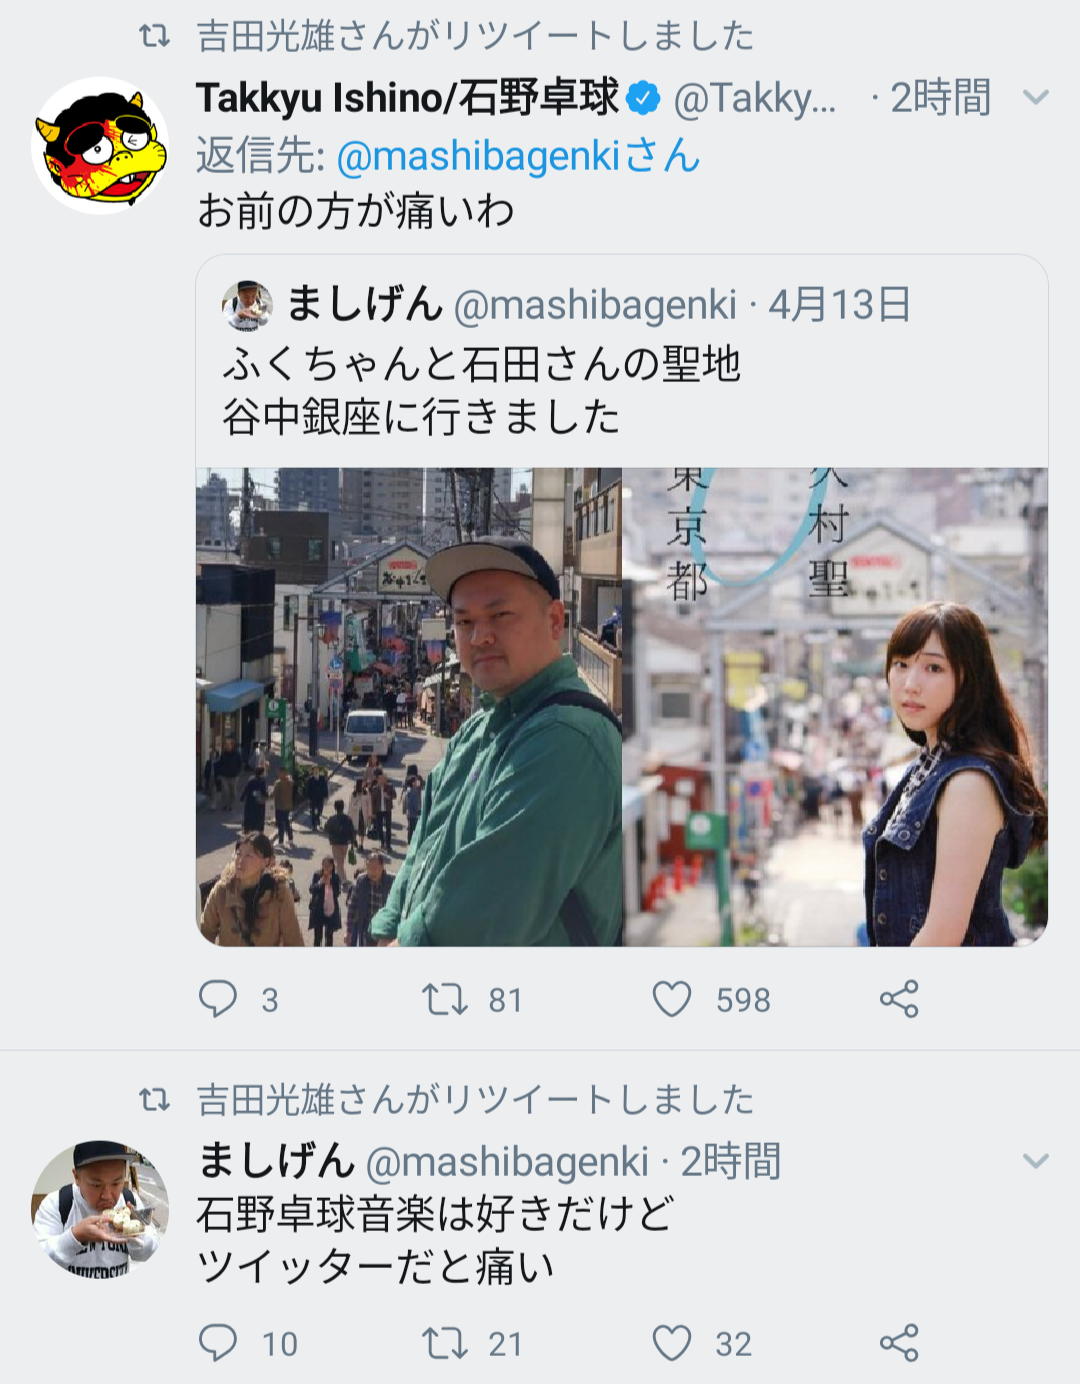 http://www.mybitchisajunky.com/whg/picture/Screenshot_20190507-102939.png